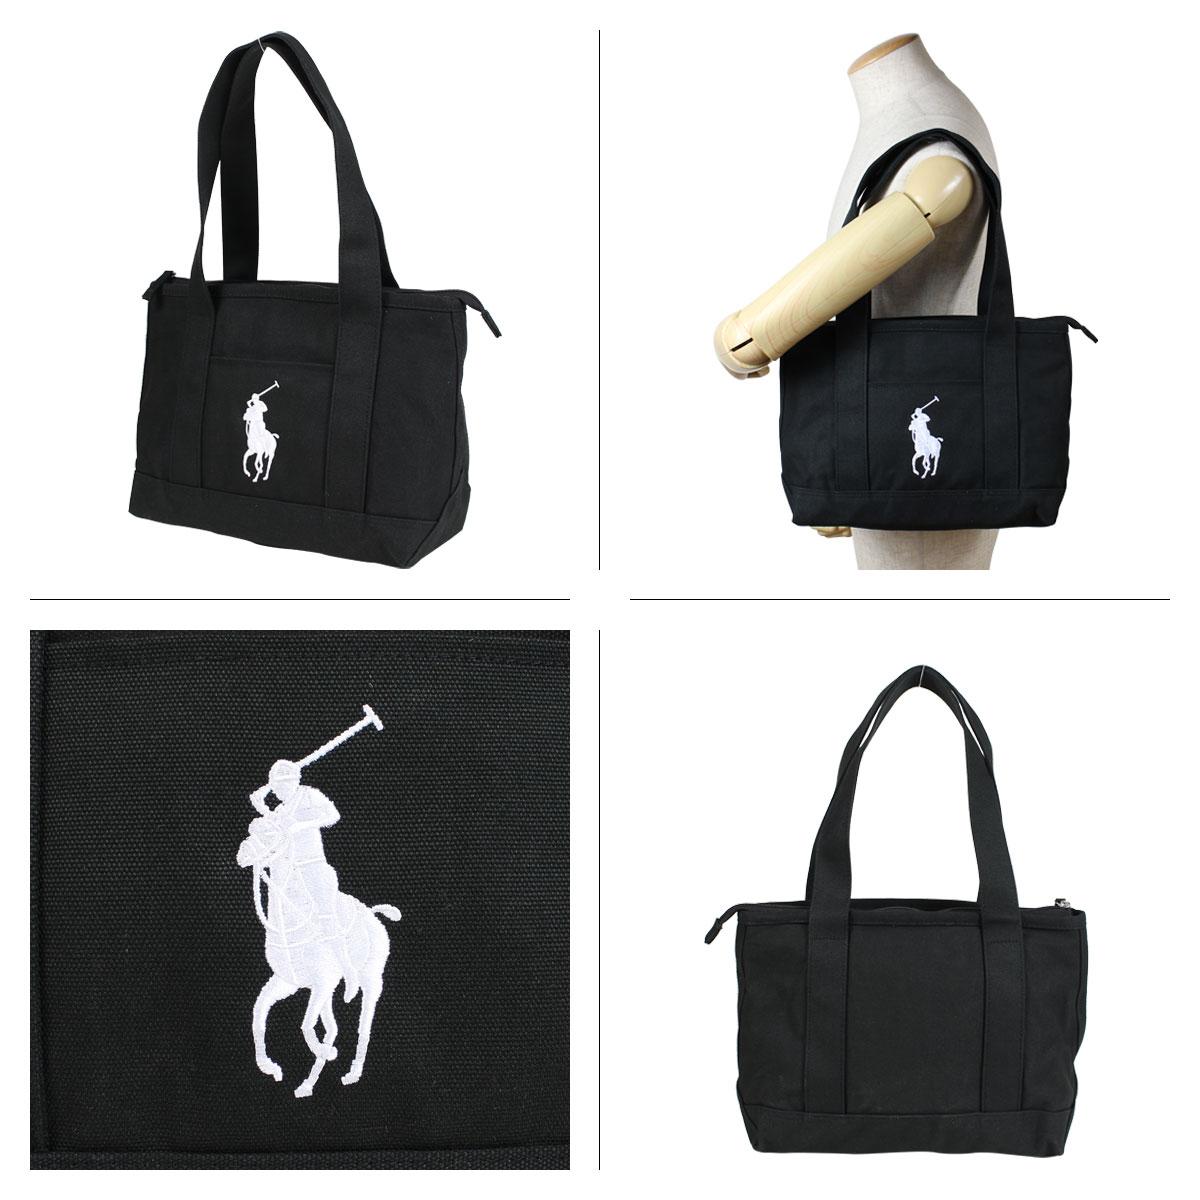 0cefa6a1ebe ... POLO RALPH LAUREN MEDIUM TOTE polo Ralph Lauren bag tote bag men gap  Dis canvas black ...